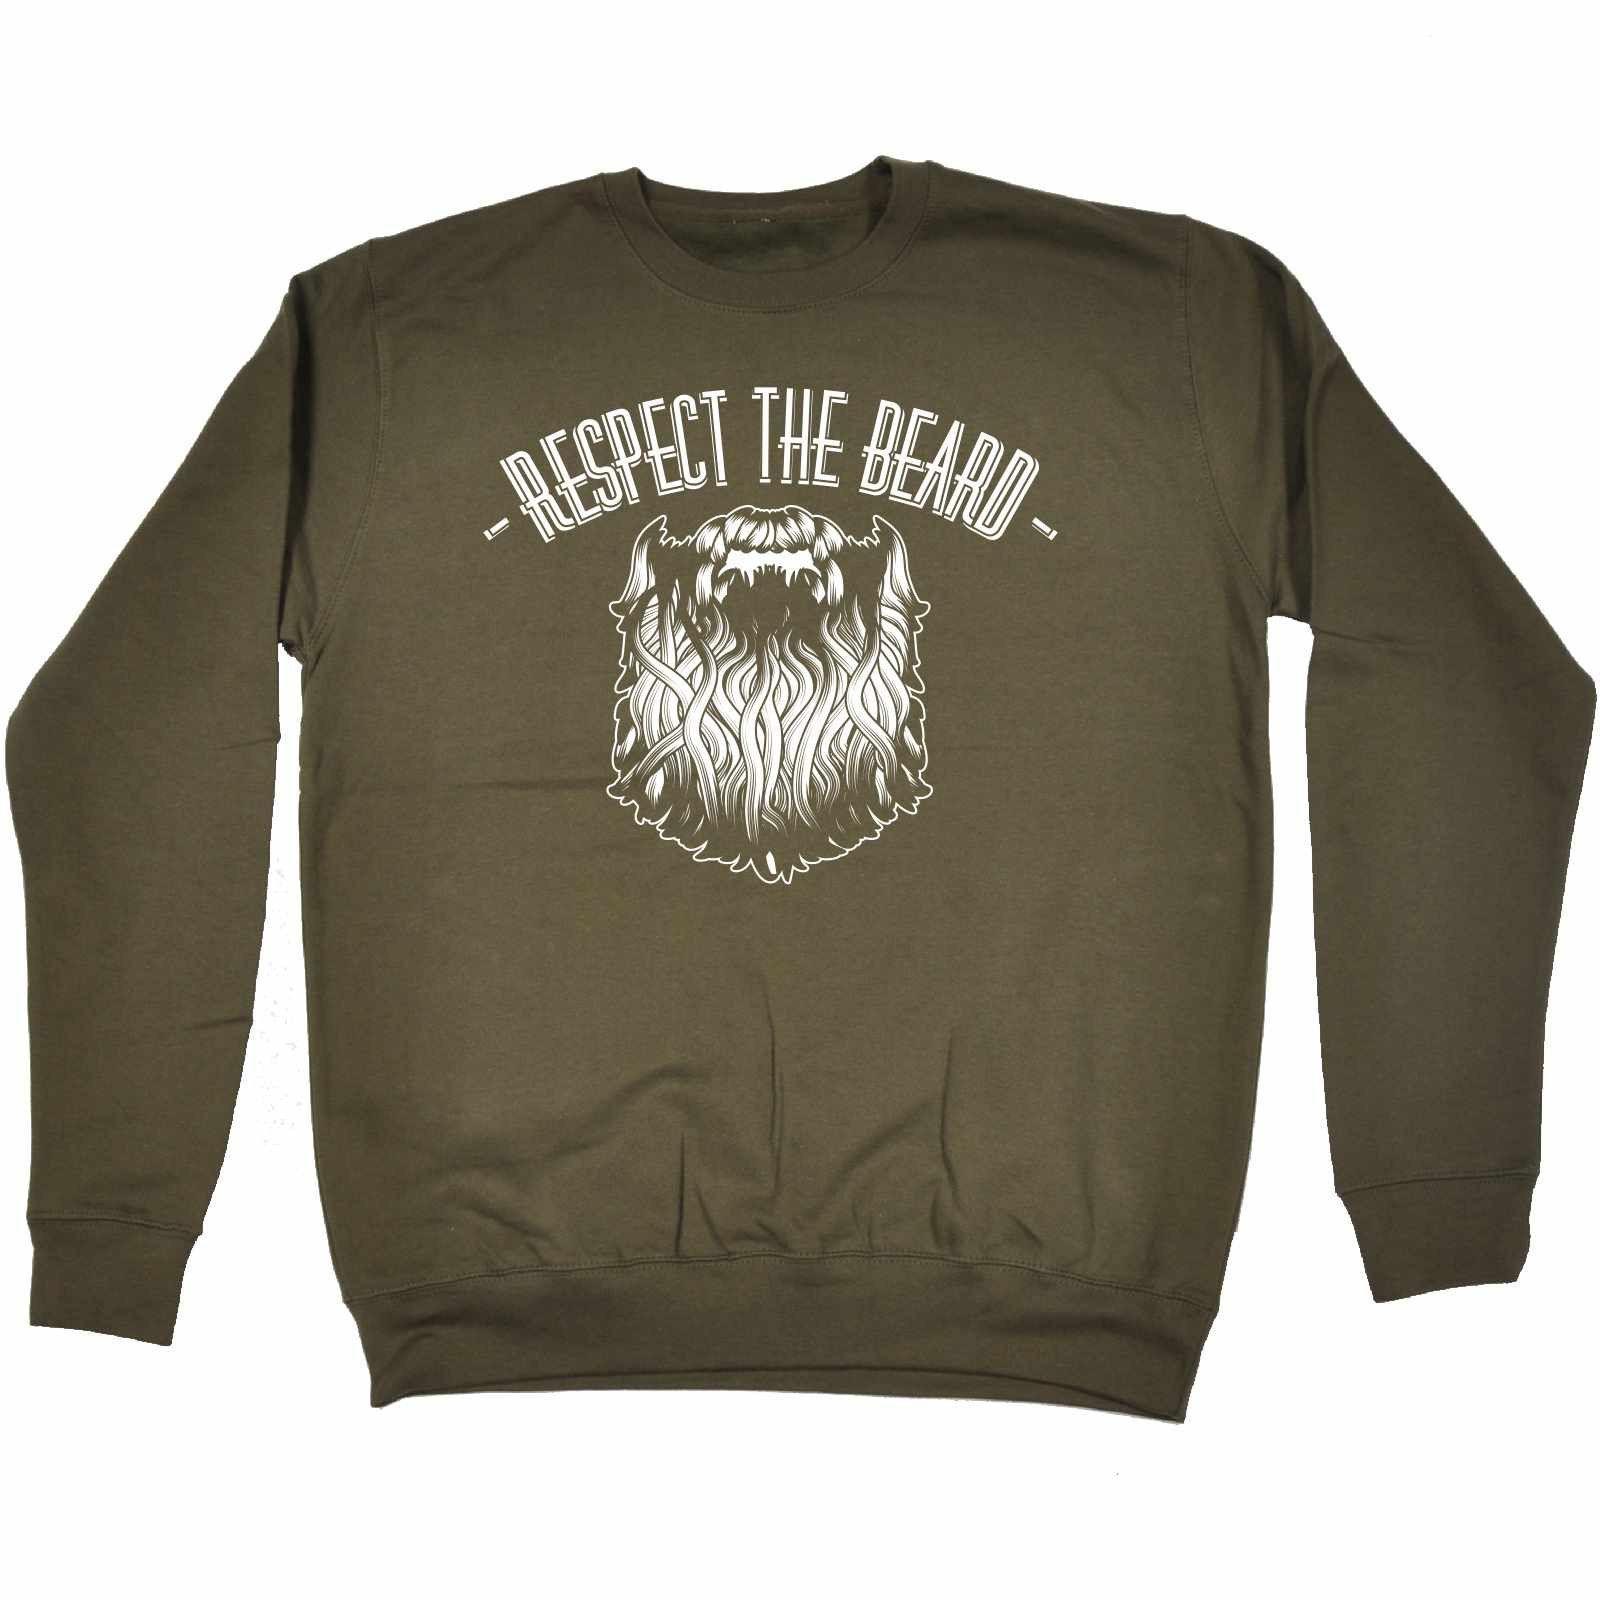 123t USA Respect The Beard Funny Sweatshirt